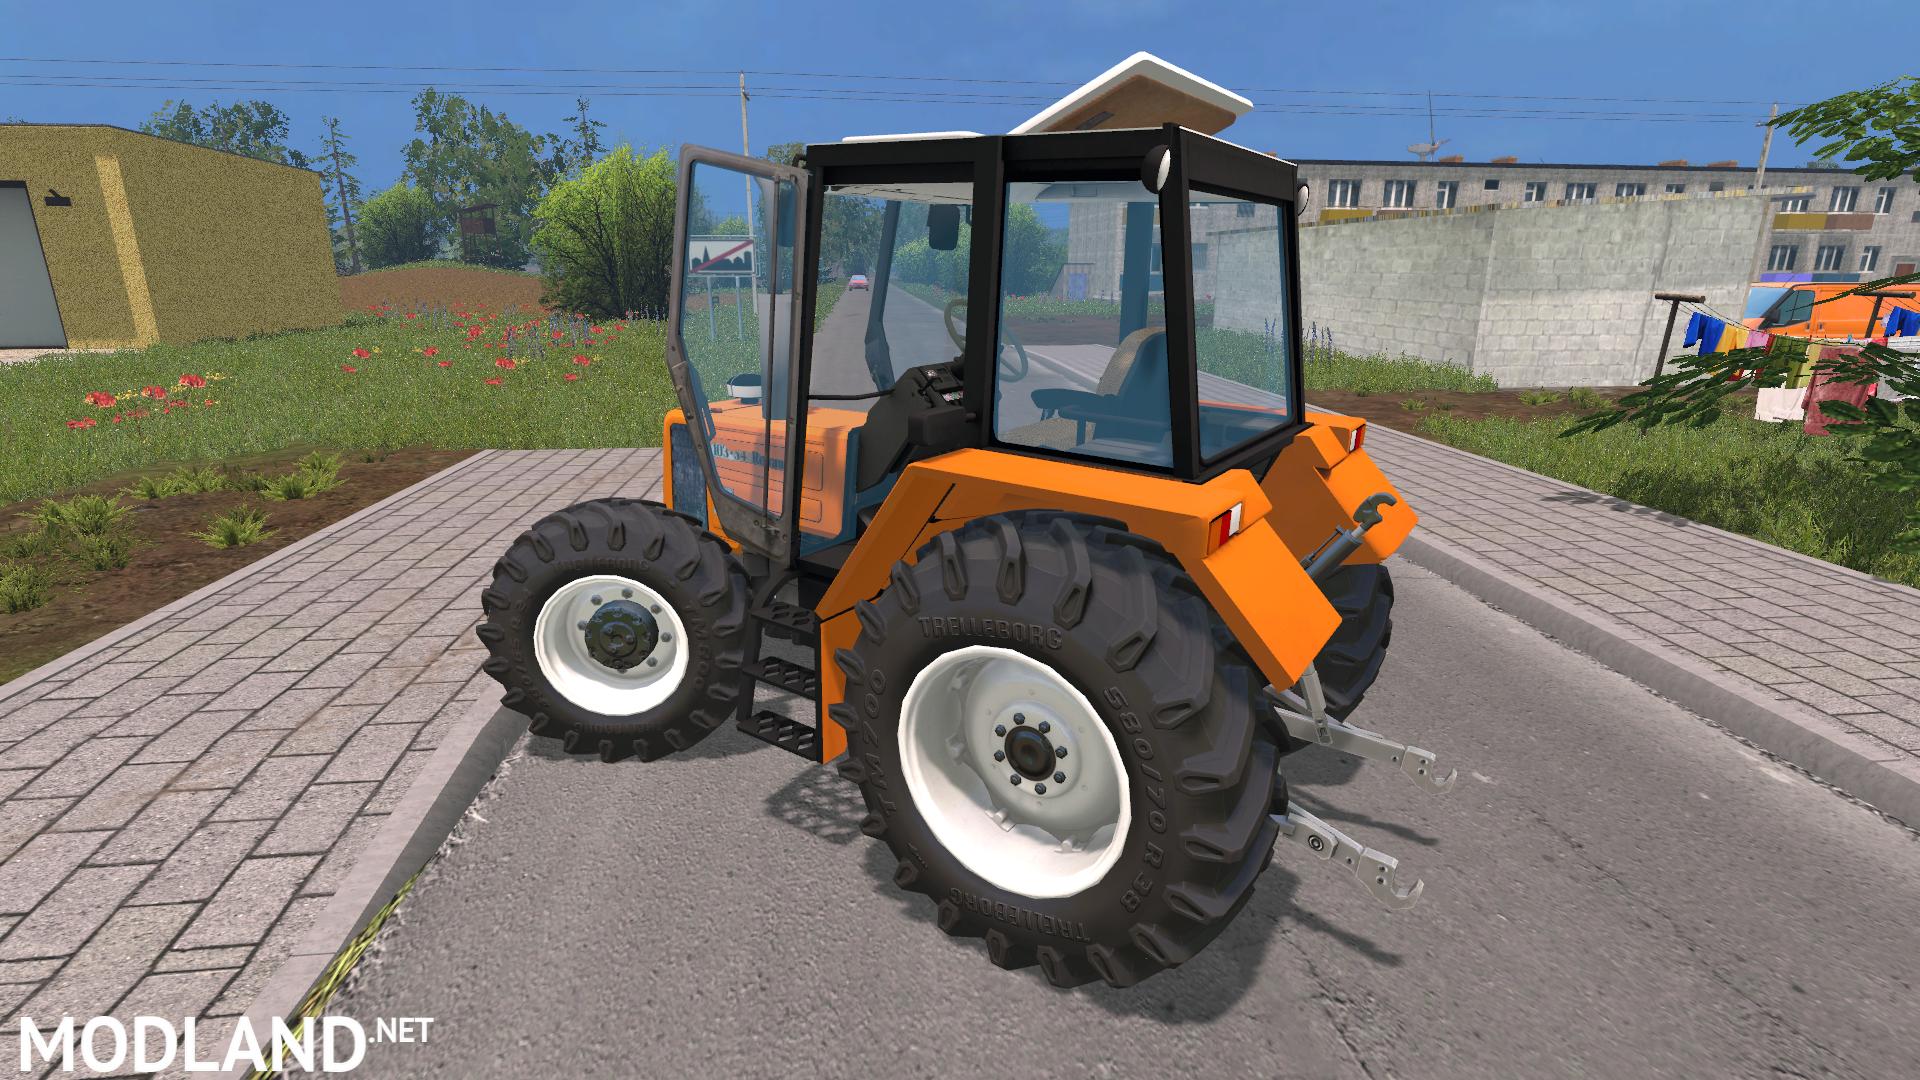 Farming simulator 17 manual pdf Ps4 How To Make Money fast